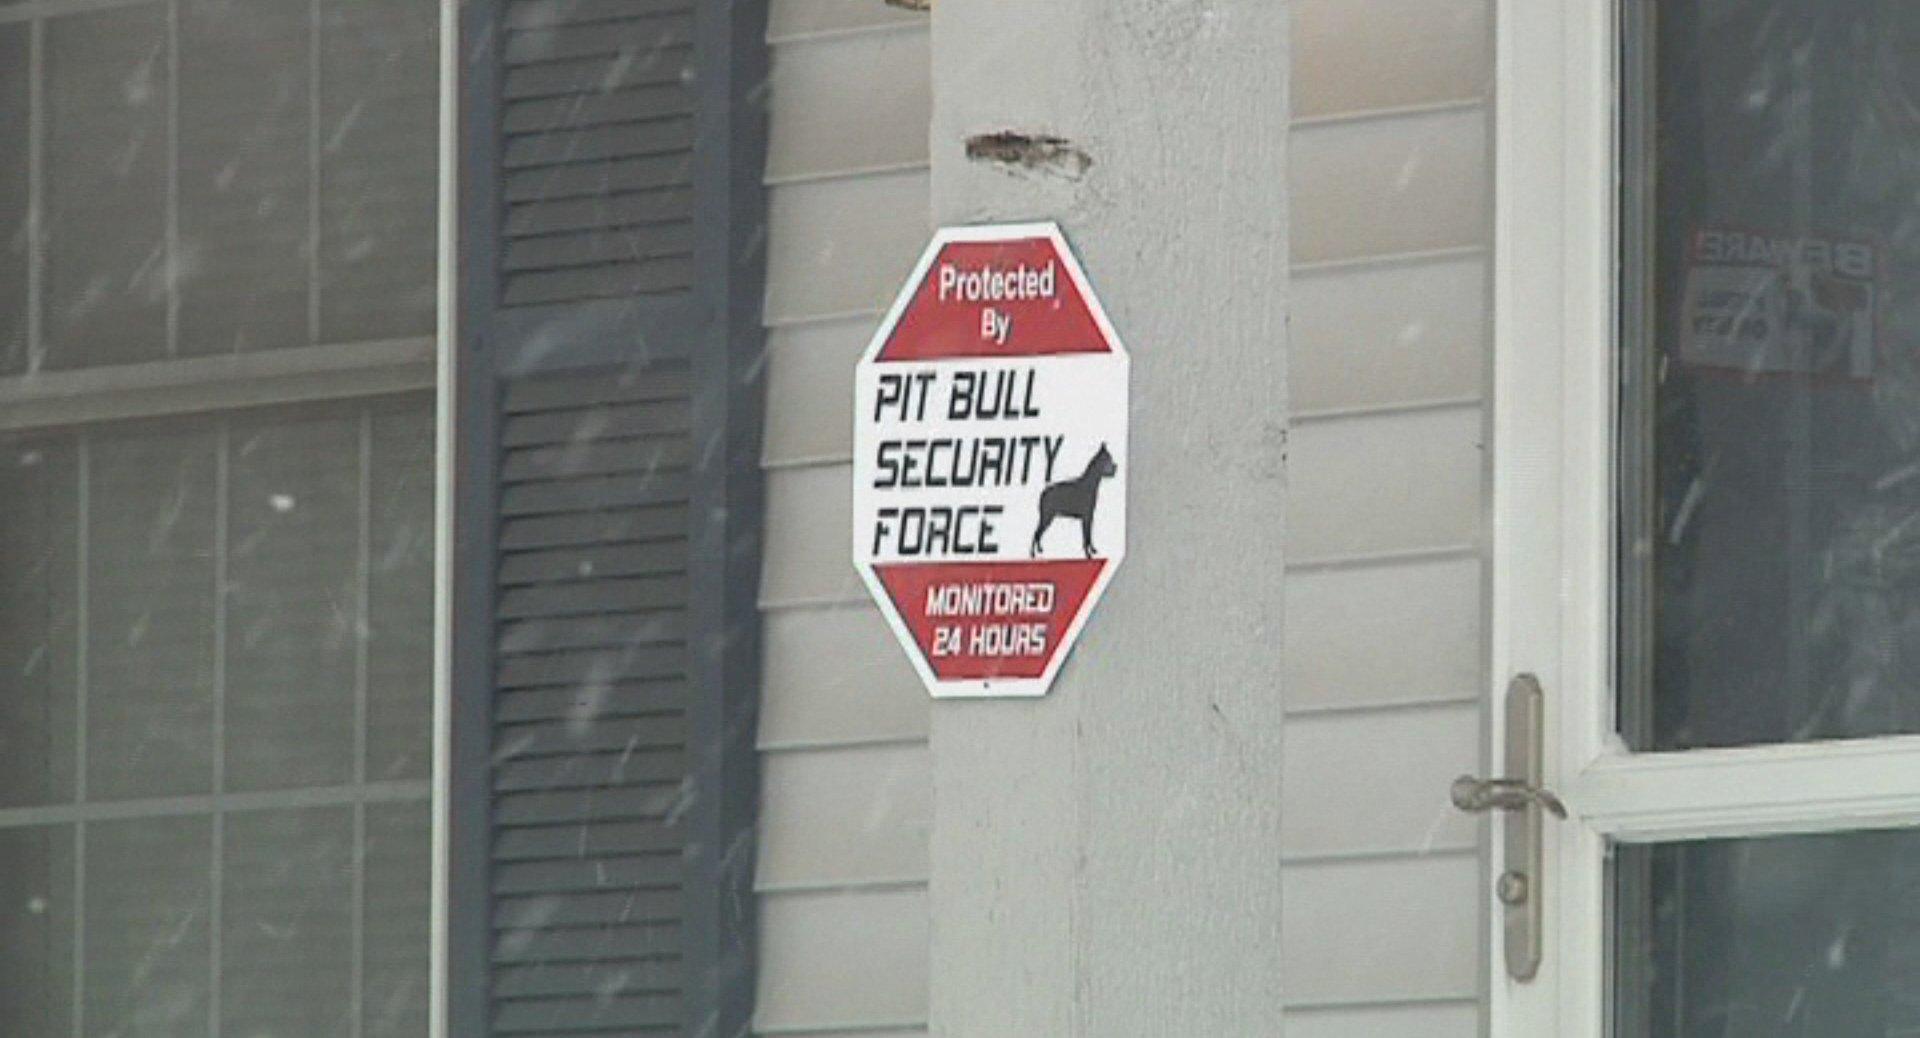 Pitbulls attack 4yearold  Wandtvcom, NewsCenter17  ~ Wand Tv Local News Headlines